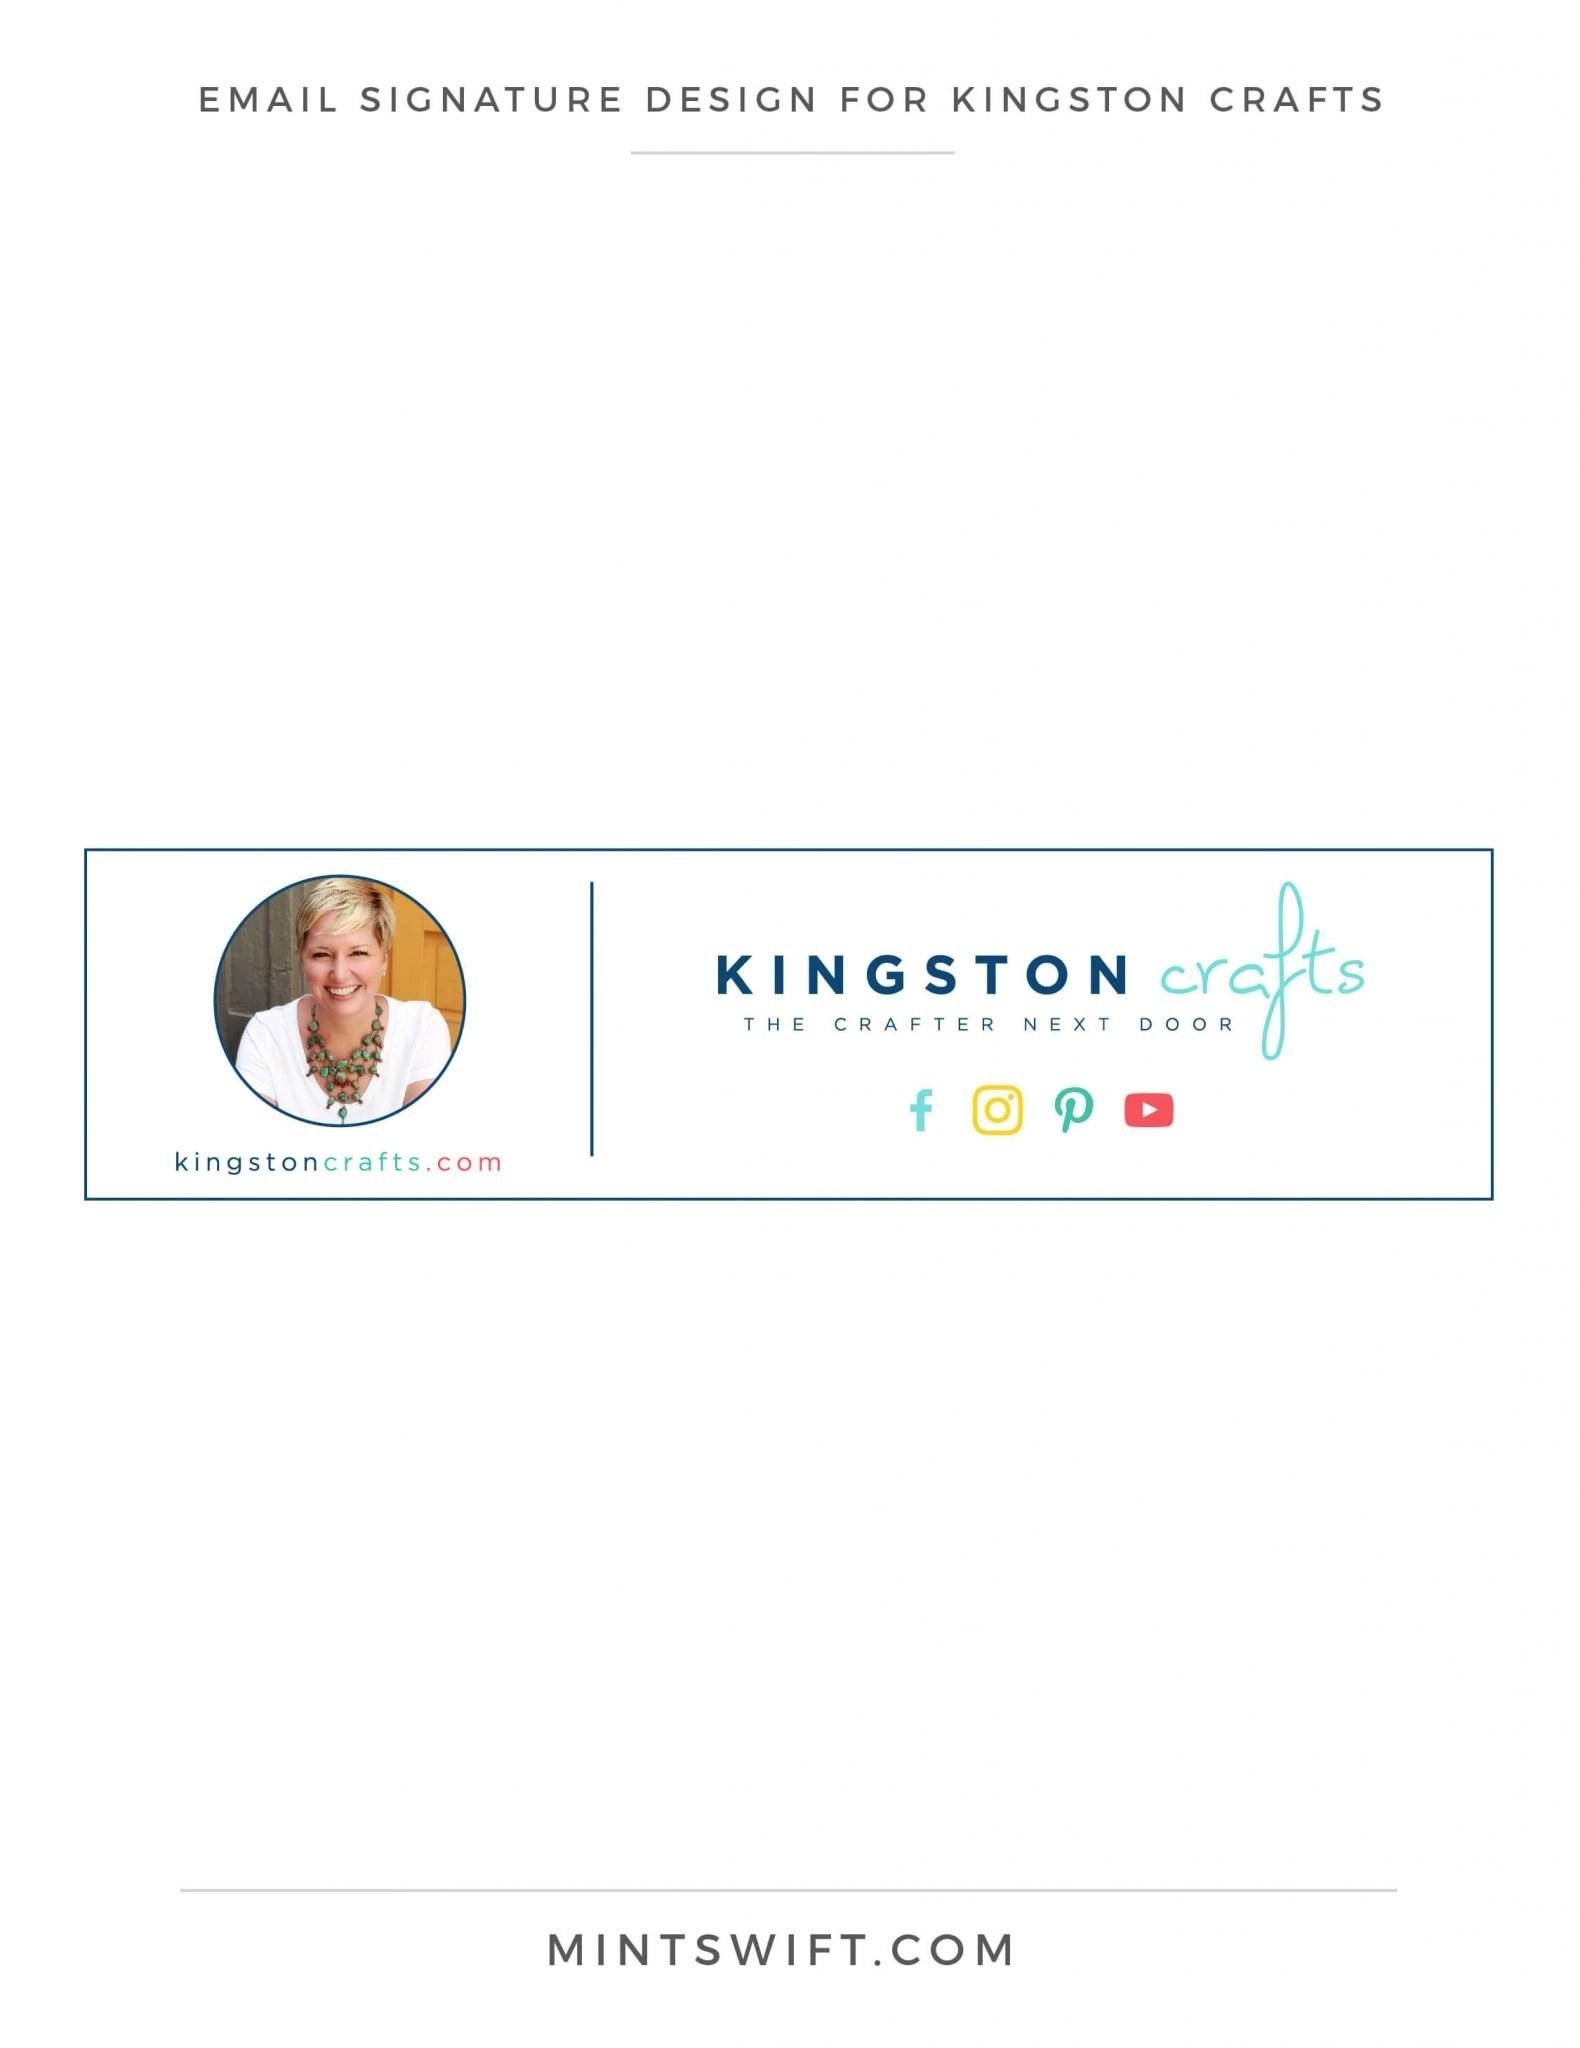 Kingston Crafts - Email Signature Design - Brand Design Package - MintSwift